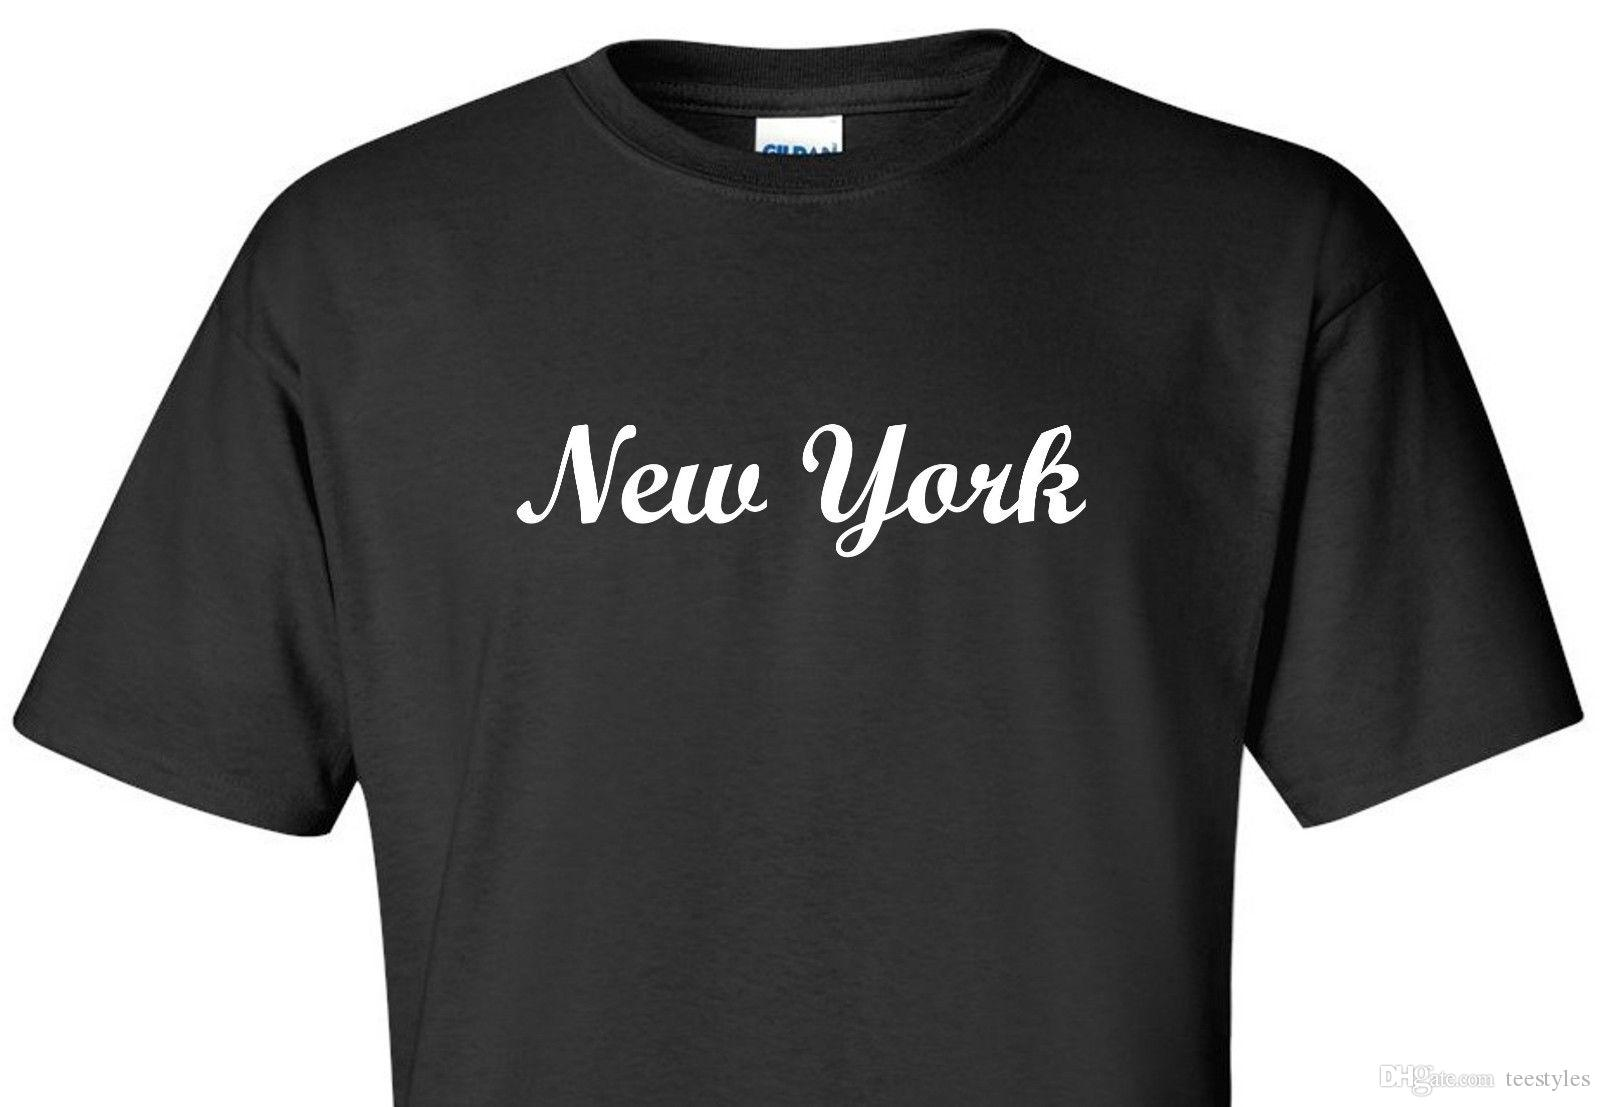 New York T Shirt Nyc New York City Manhattan Bronx Brooklyn Queens Black Shirt  T Shirt O Neck Cotton Short Sleeve Clothes New Style Hot Sale Offensive T  ... a7d4ecd1fb4